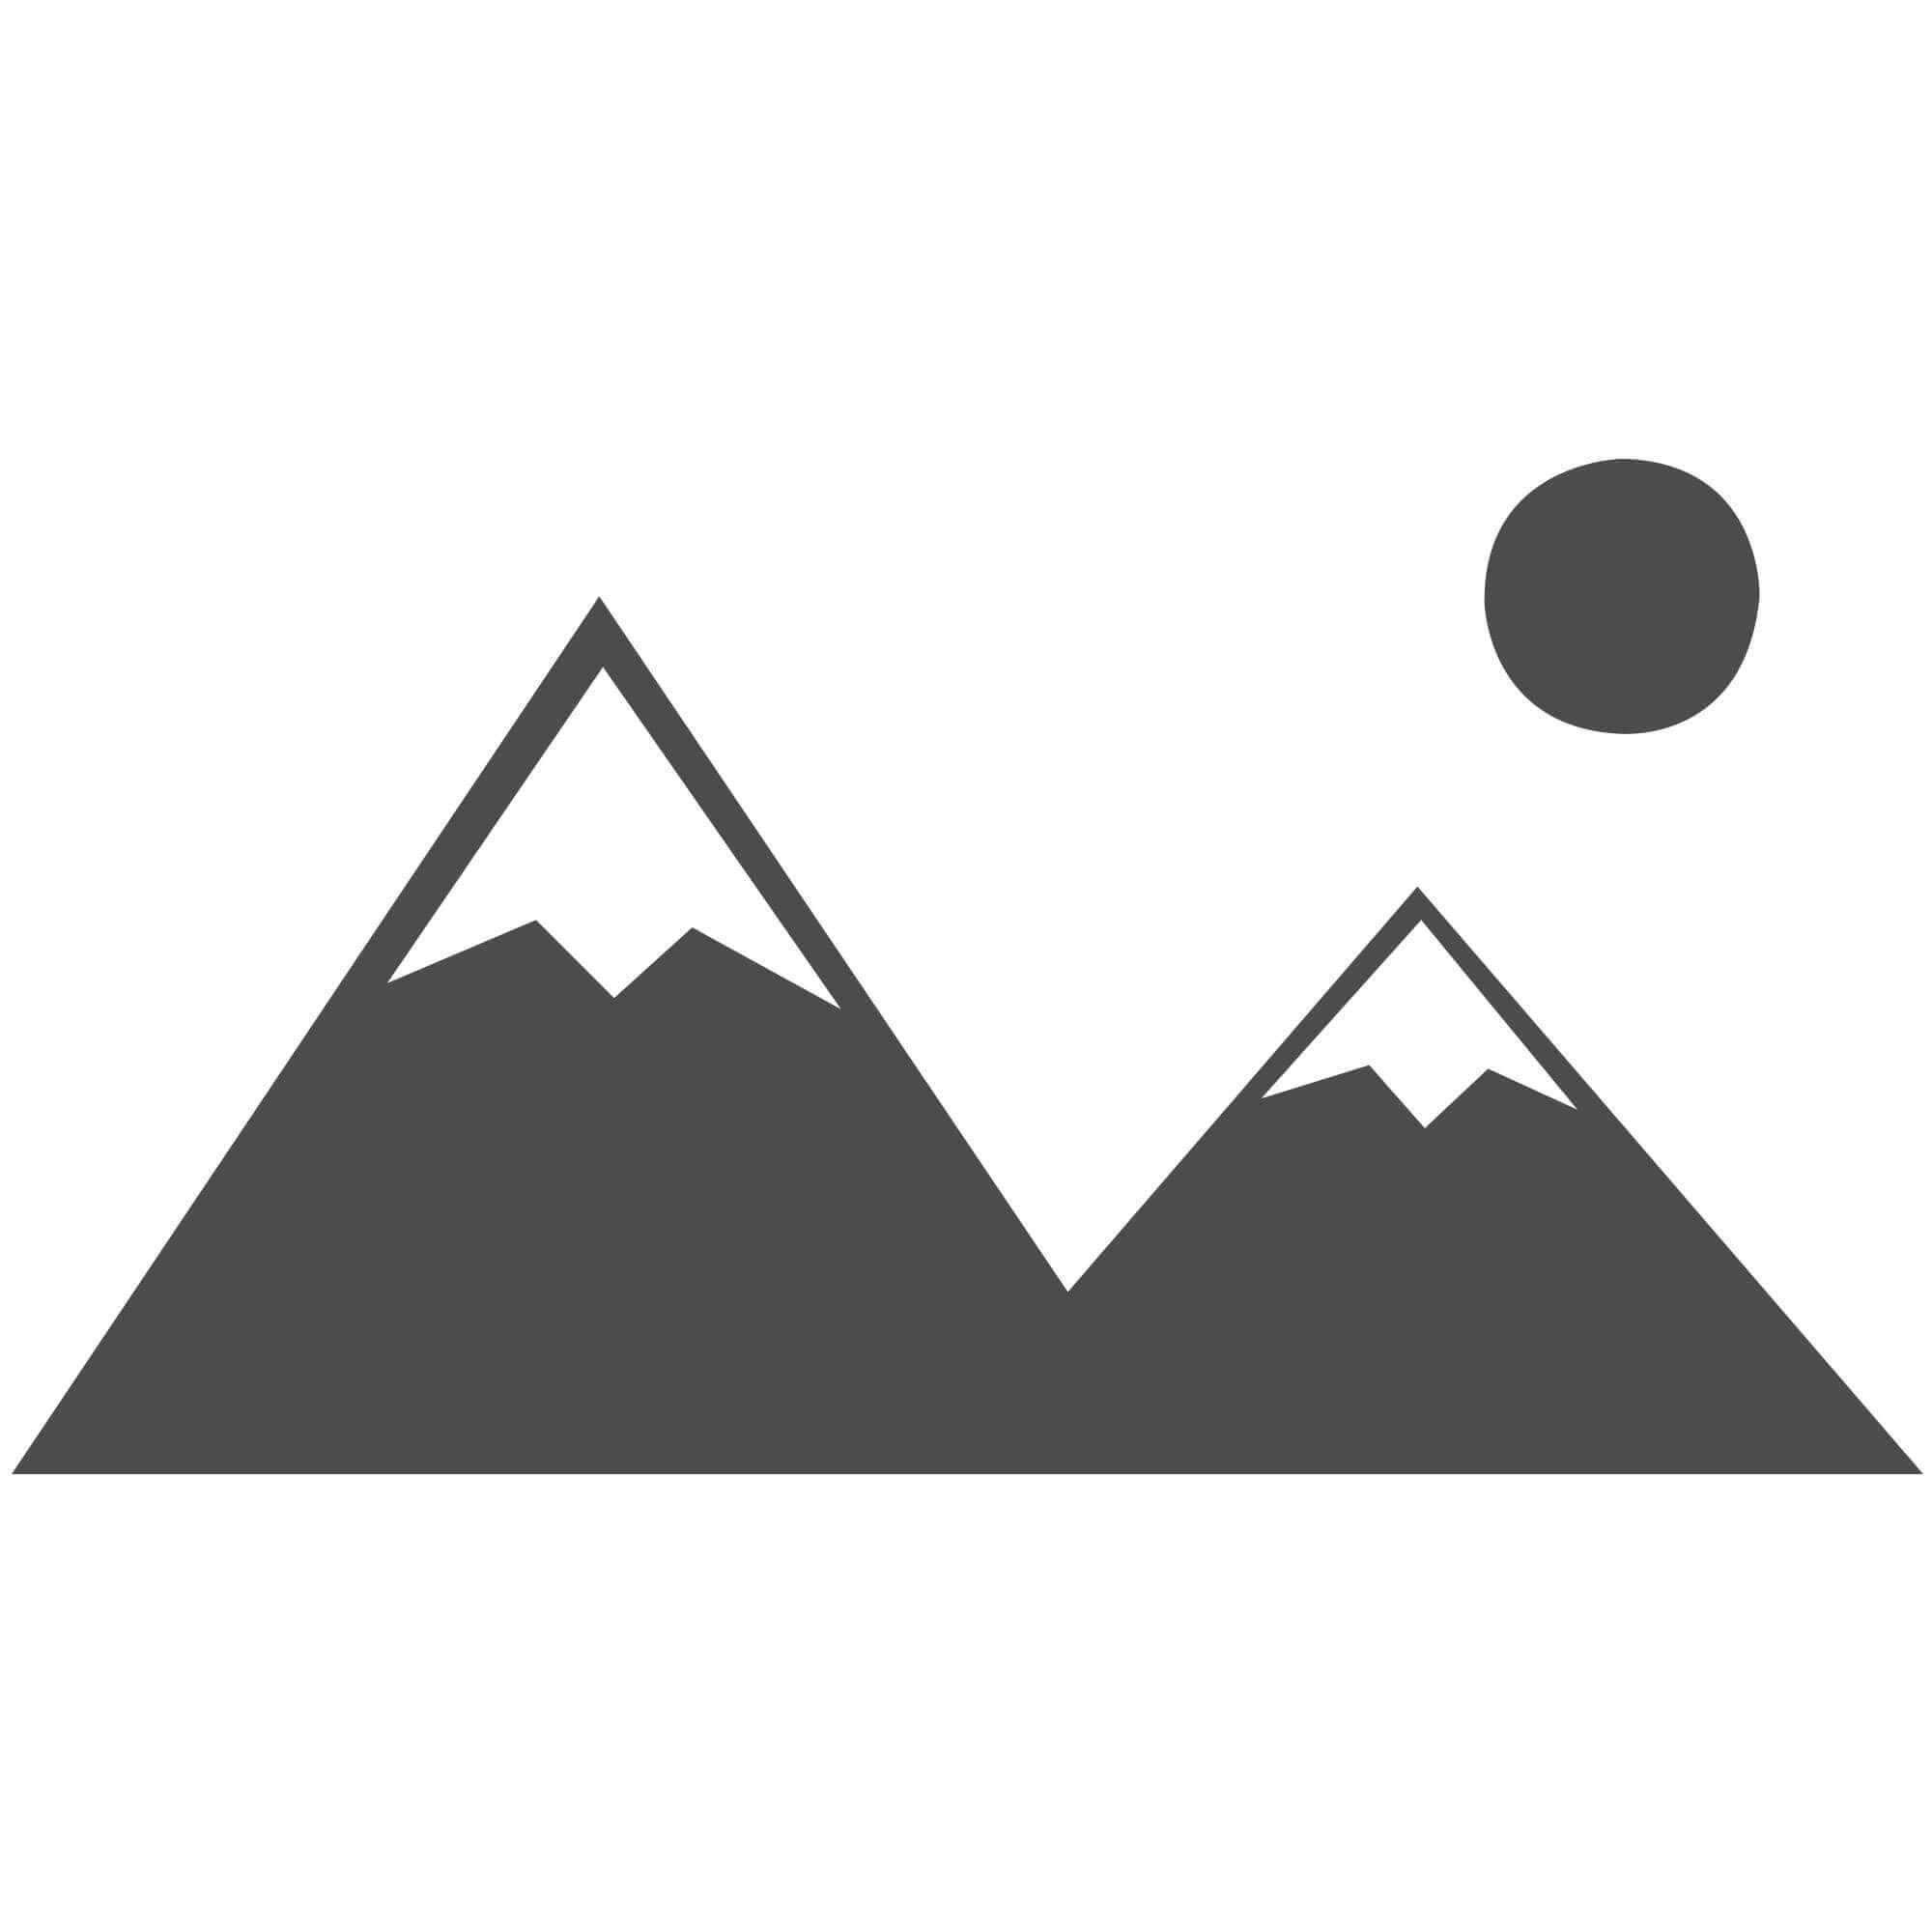 "Athena Shaggy Rug - Silver - Size 120 x 170 cm (4' x 5'7"")"